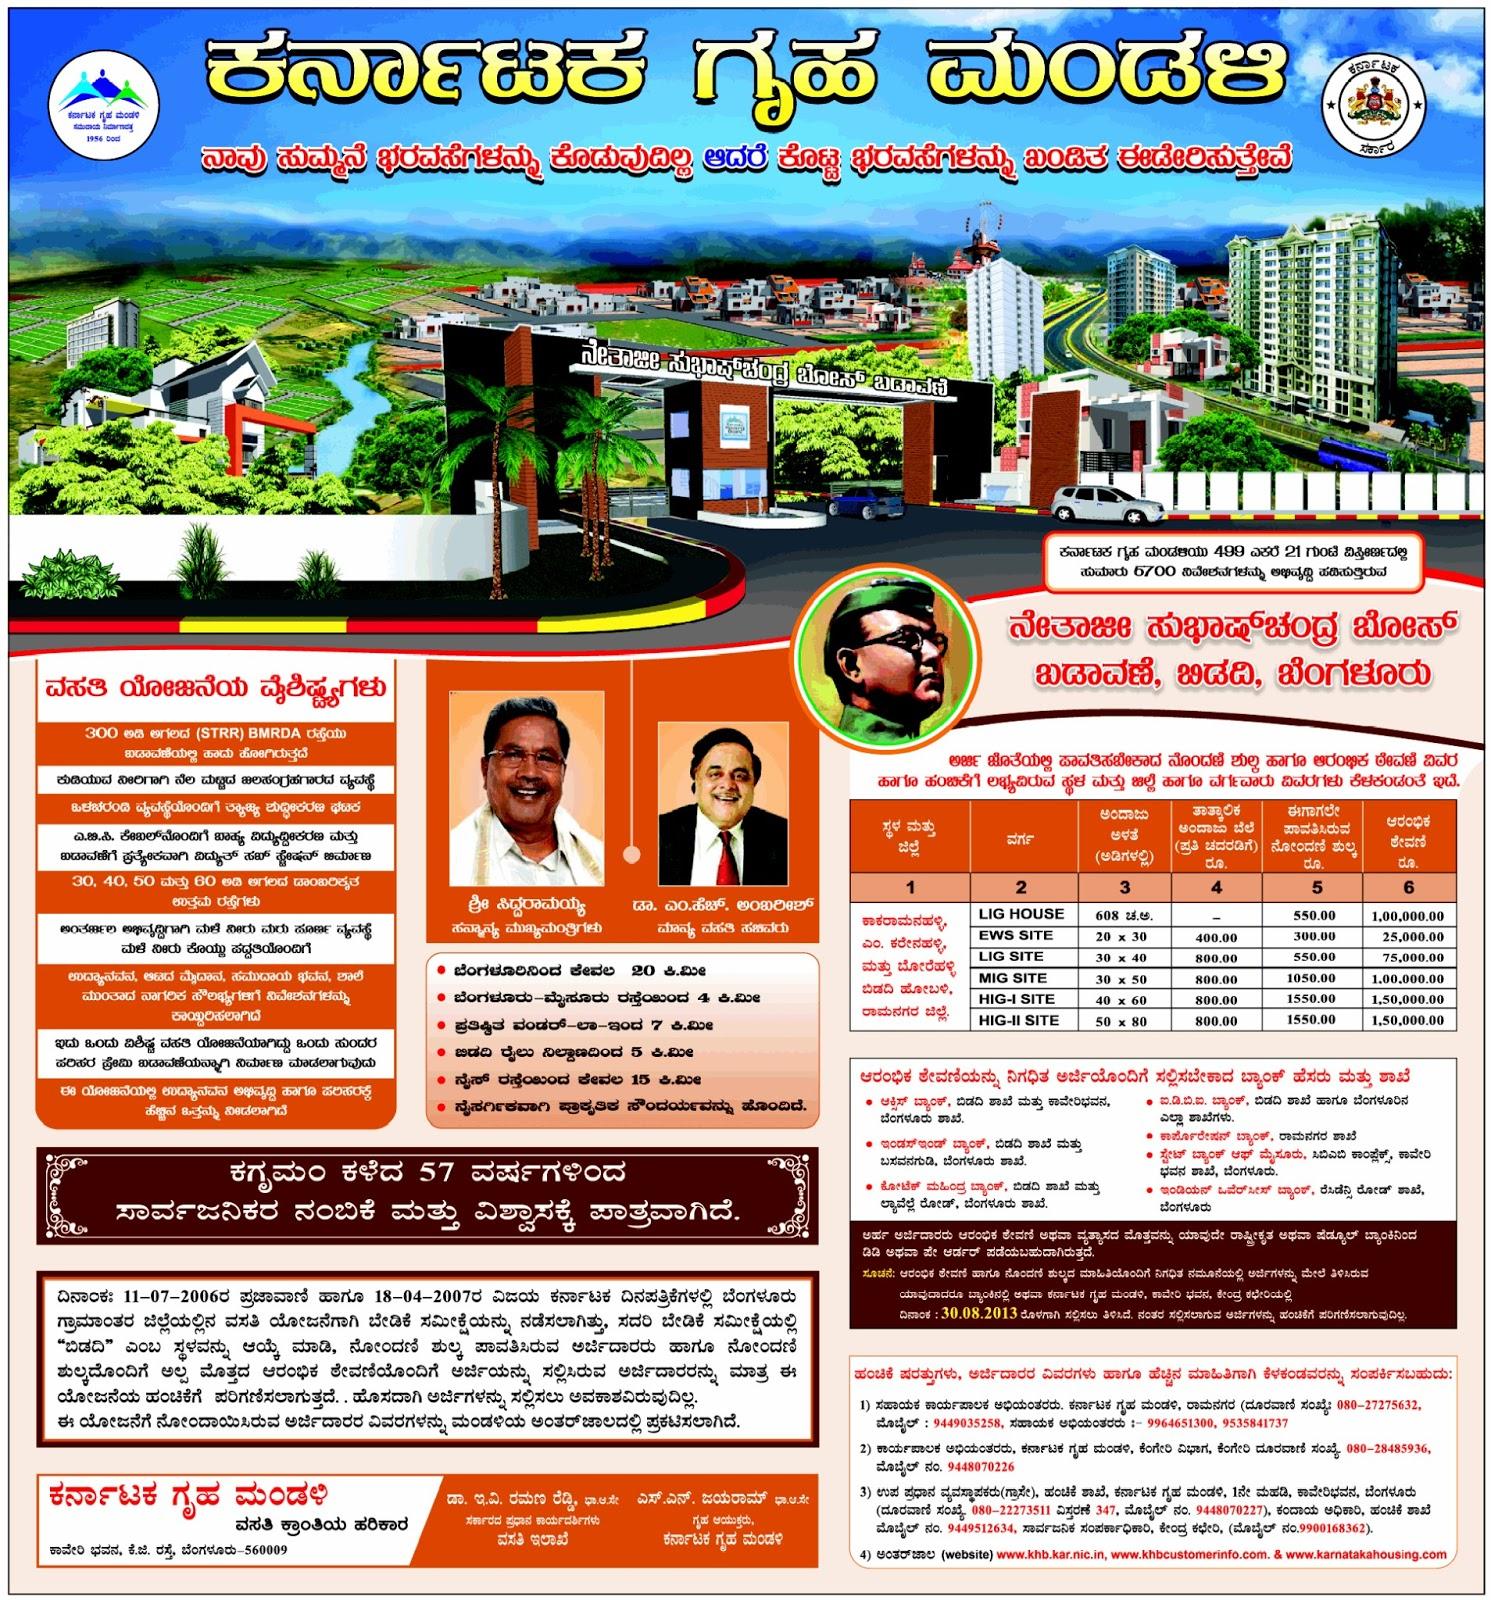 Karnataka Housing Board Netaji Subhas Chandra Bose Colony